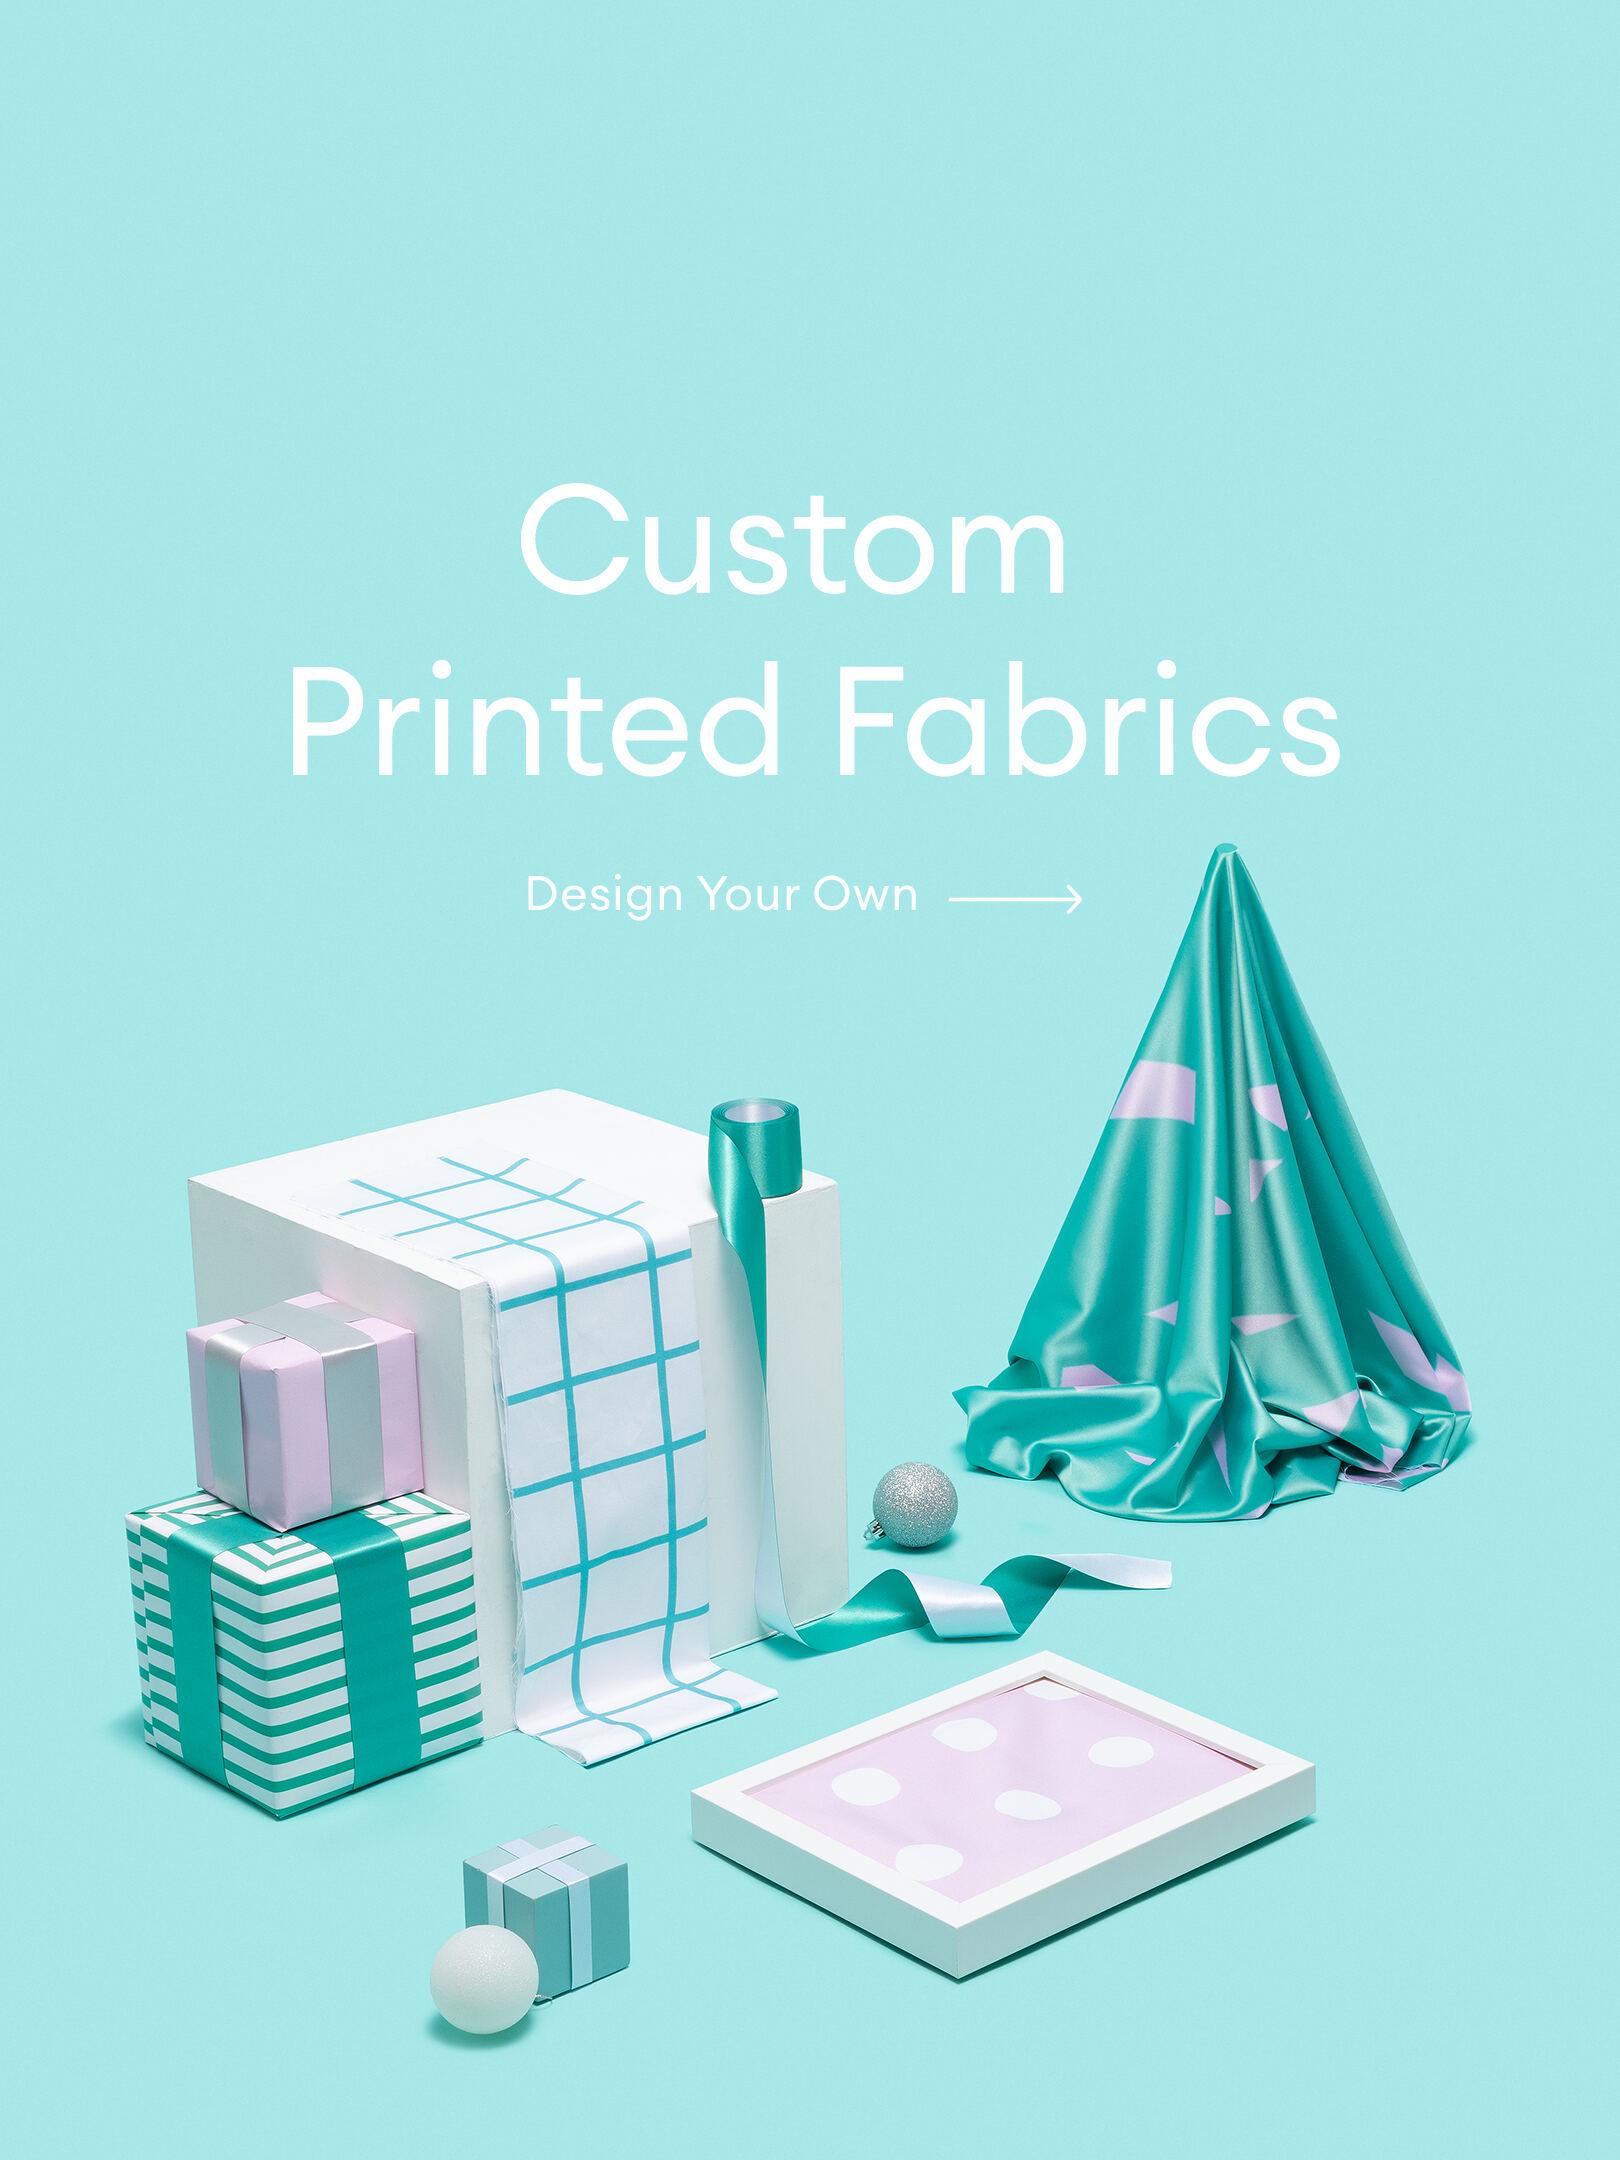 view all fabrics